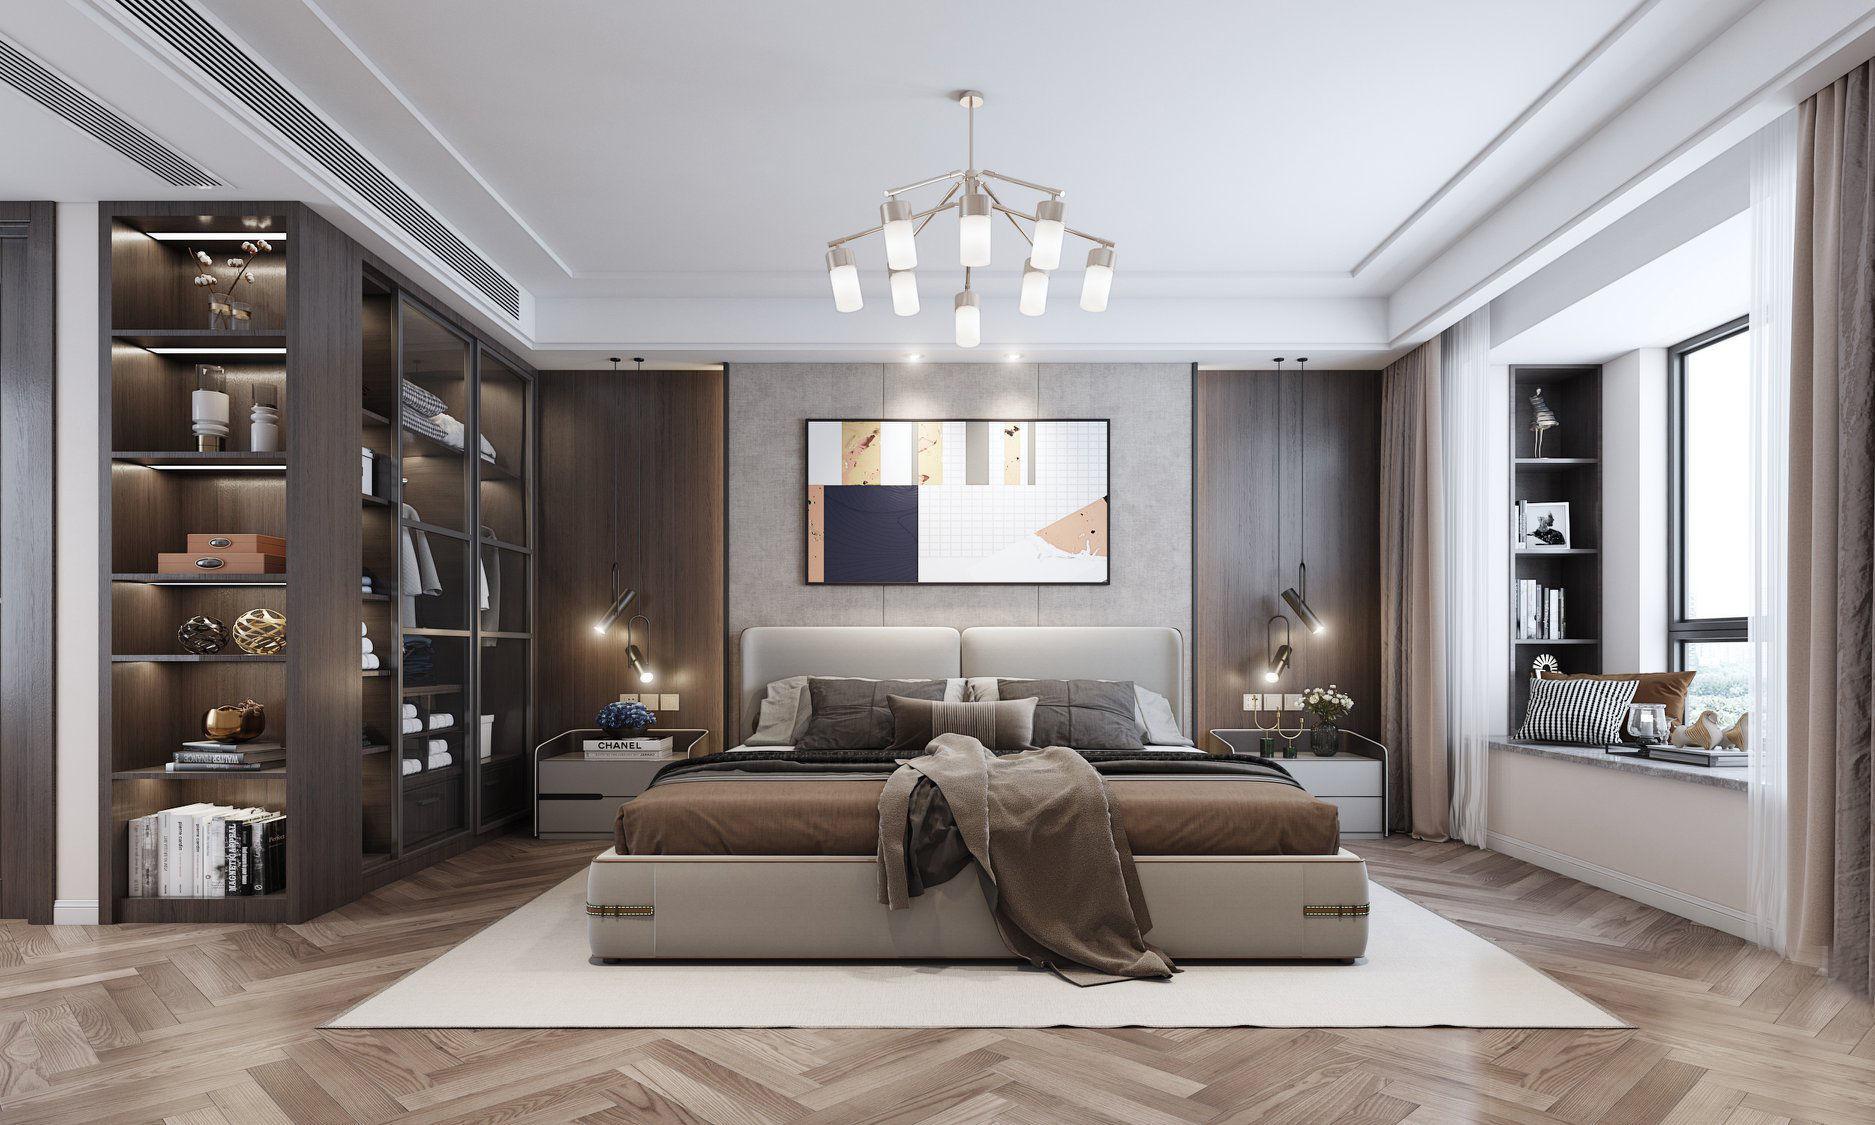 Bedroom Interior 3d Model Bedroom Cgtrader